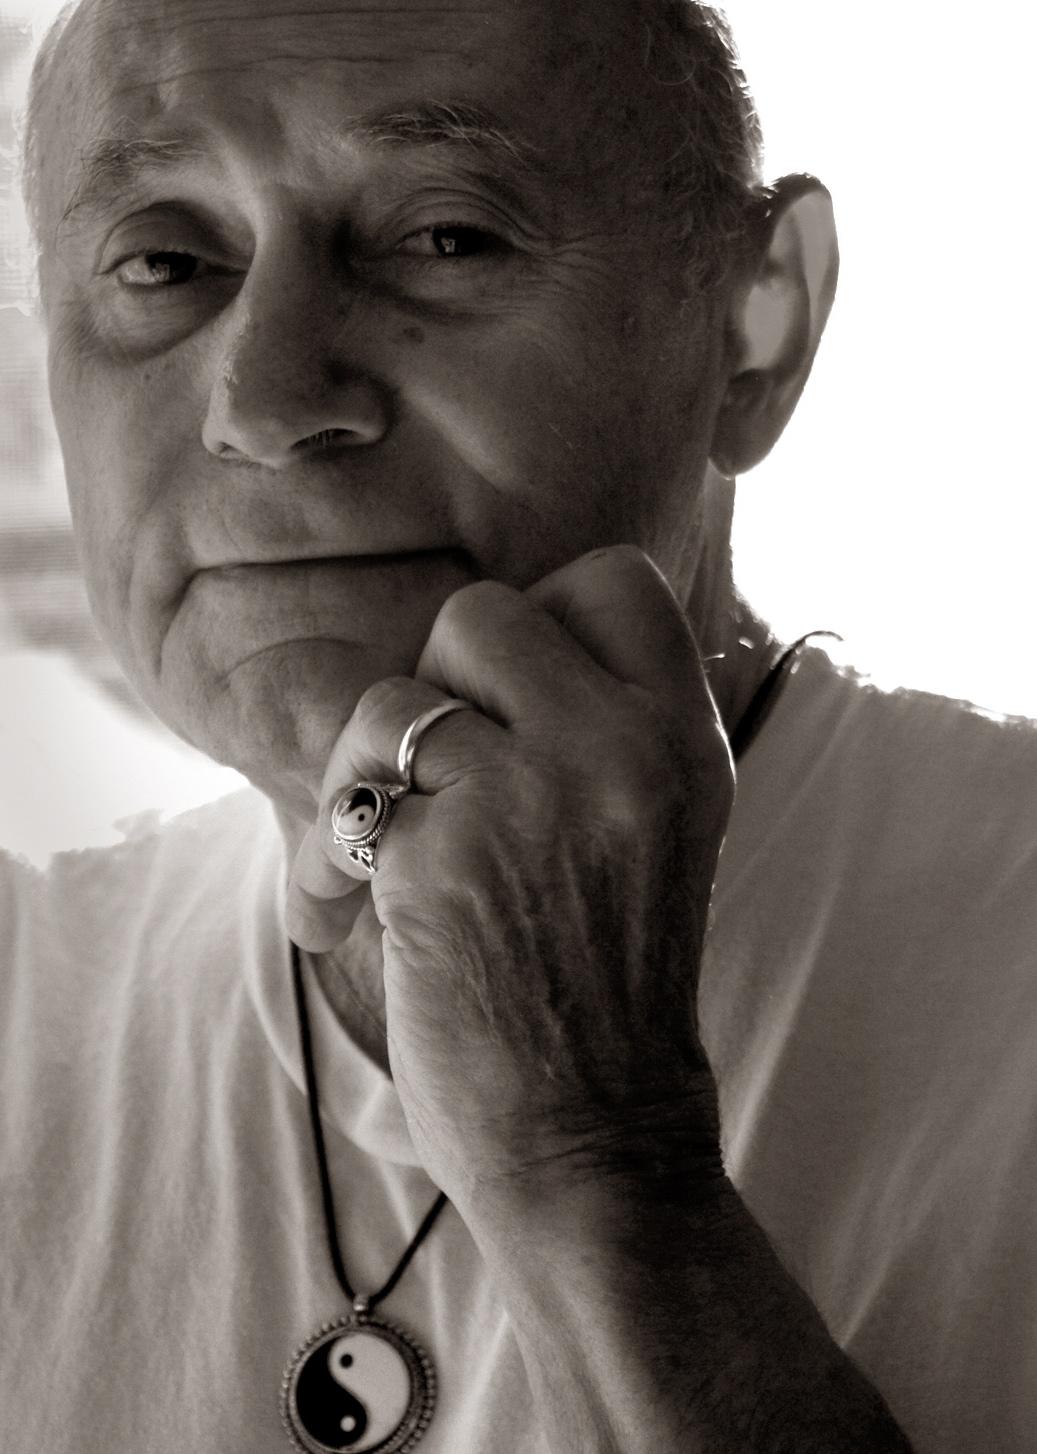 My Grandpa, Joe Lomonico //Taken in 2008 as part of my final project for photojournalism.